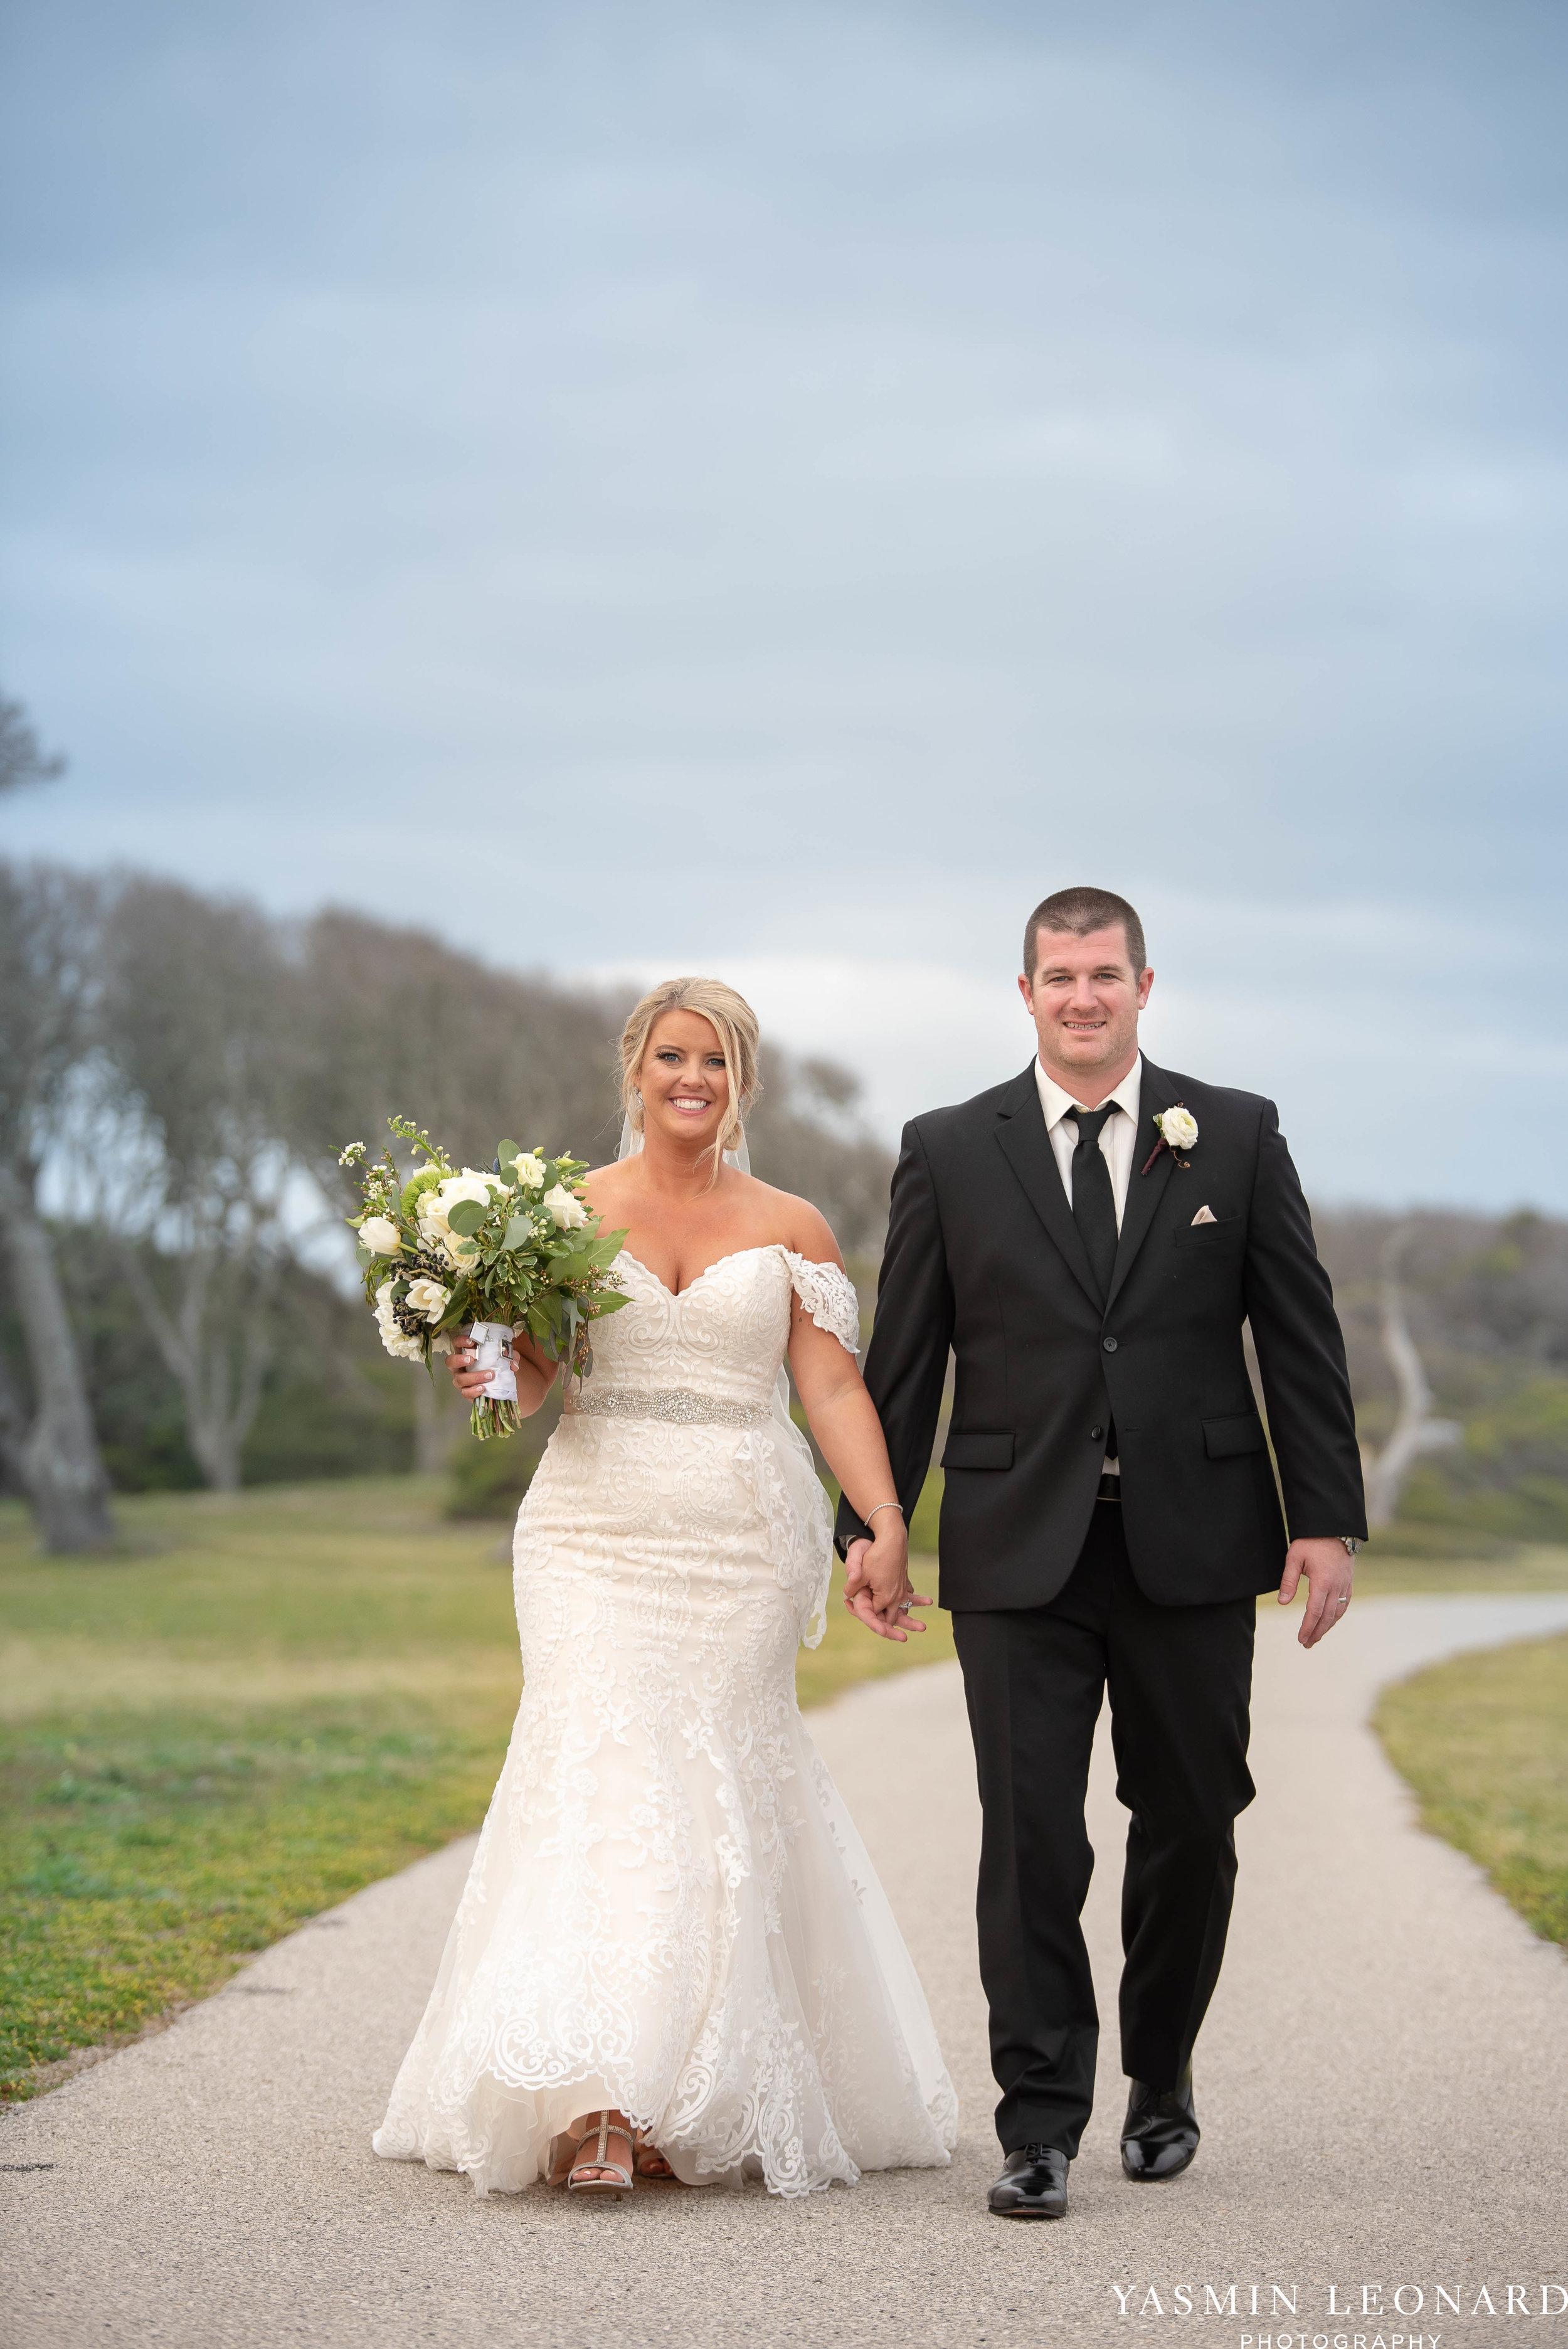 Carolina Beach Wedding - Fort Fisher Wedding - NC Acquarium - Beach Wedding - NC Wedding - Beach Wedding Inspiration - Beach Bride-30.jpg